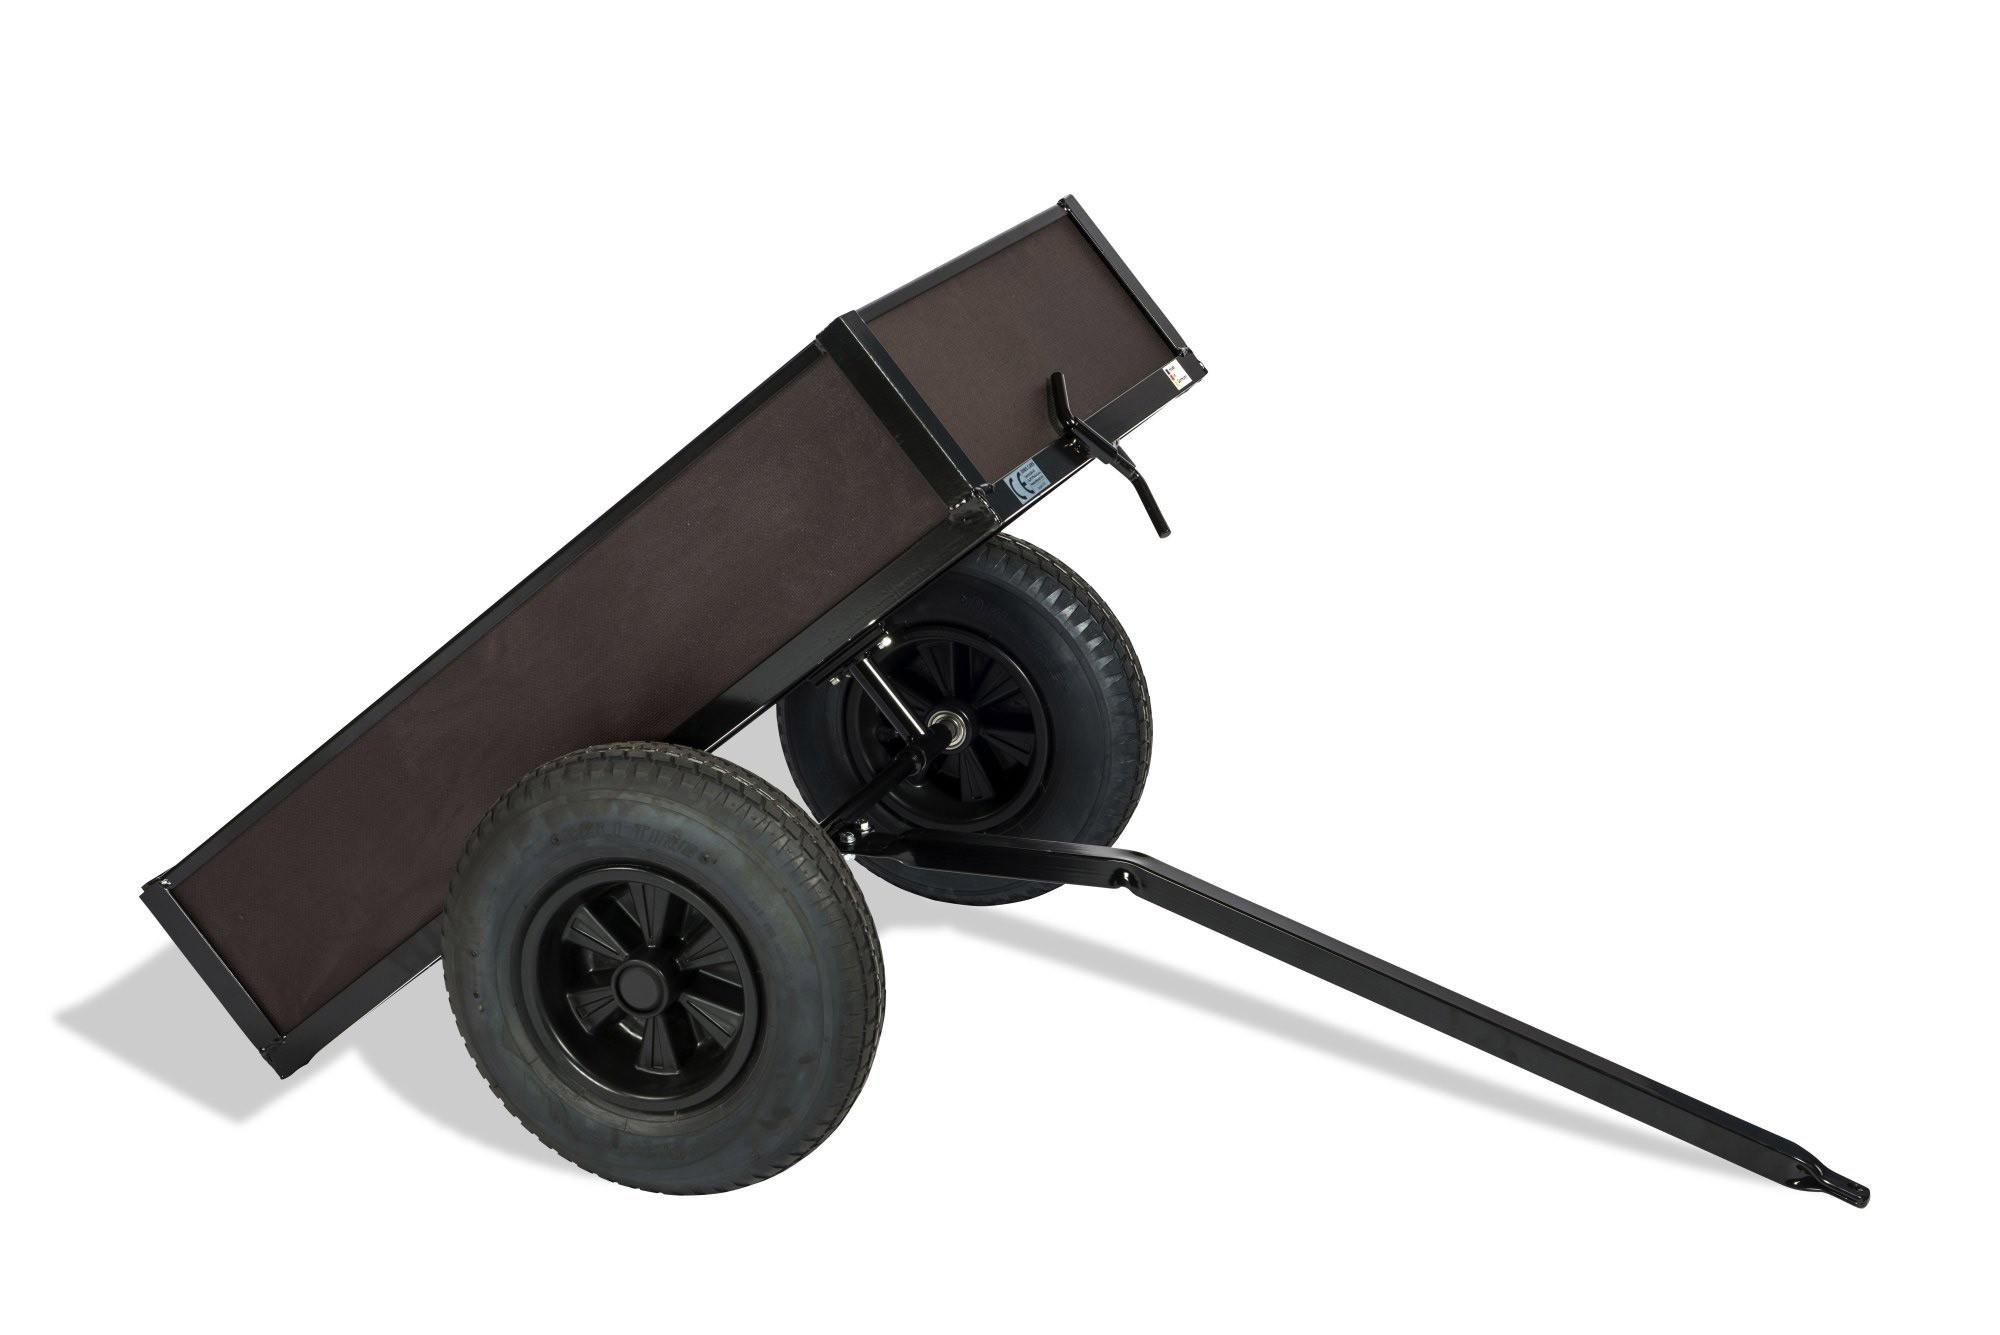 Kippanhänger mit Grundgestell Dino Cars 90x56x21cm Bild 2